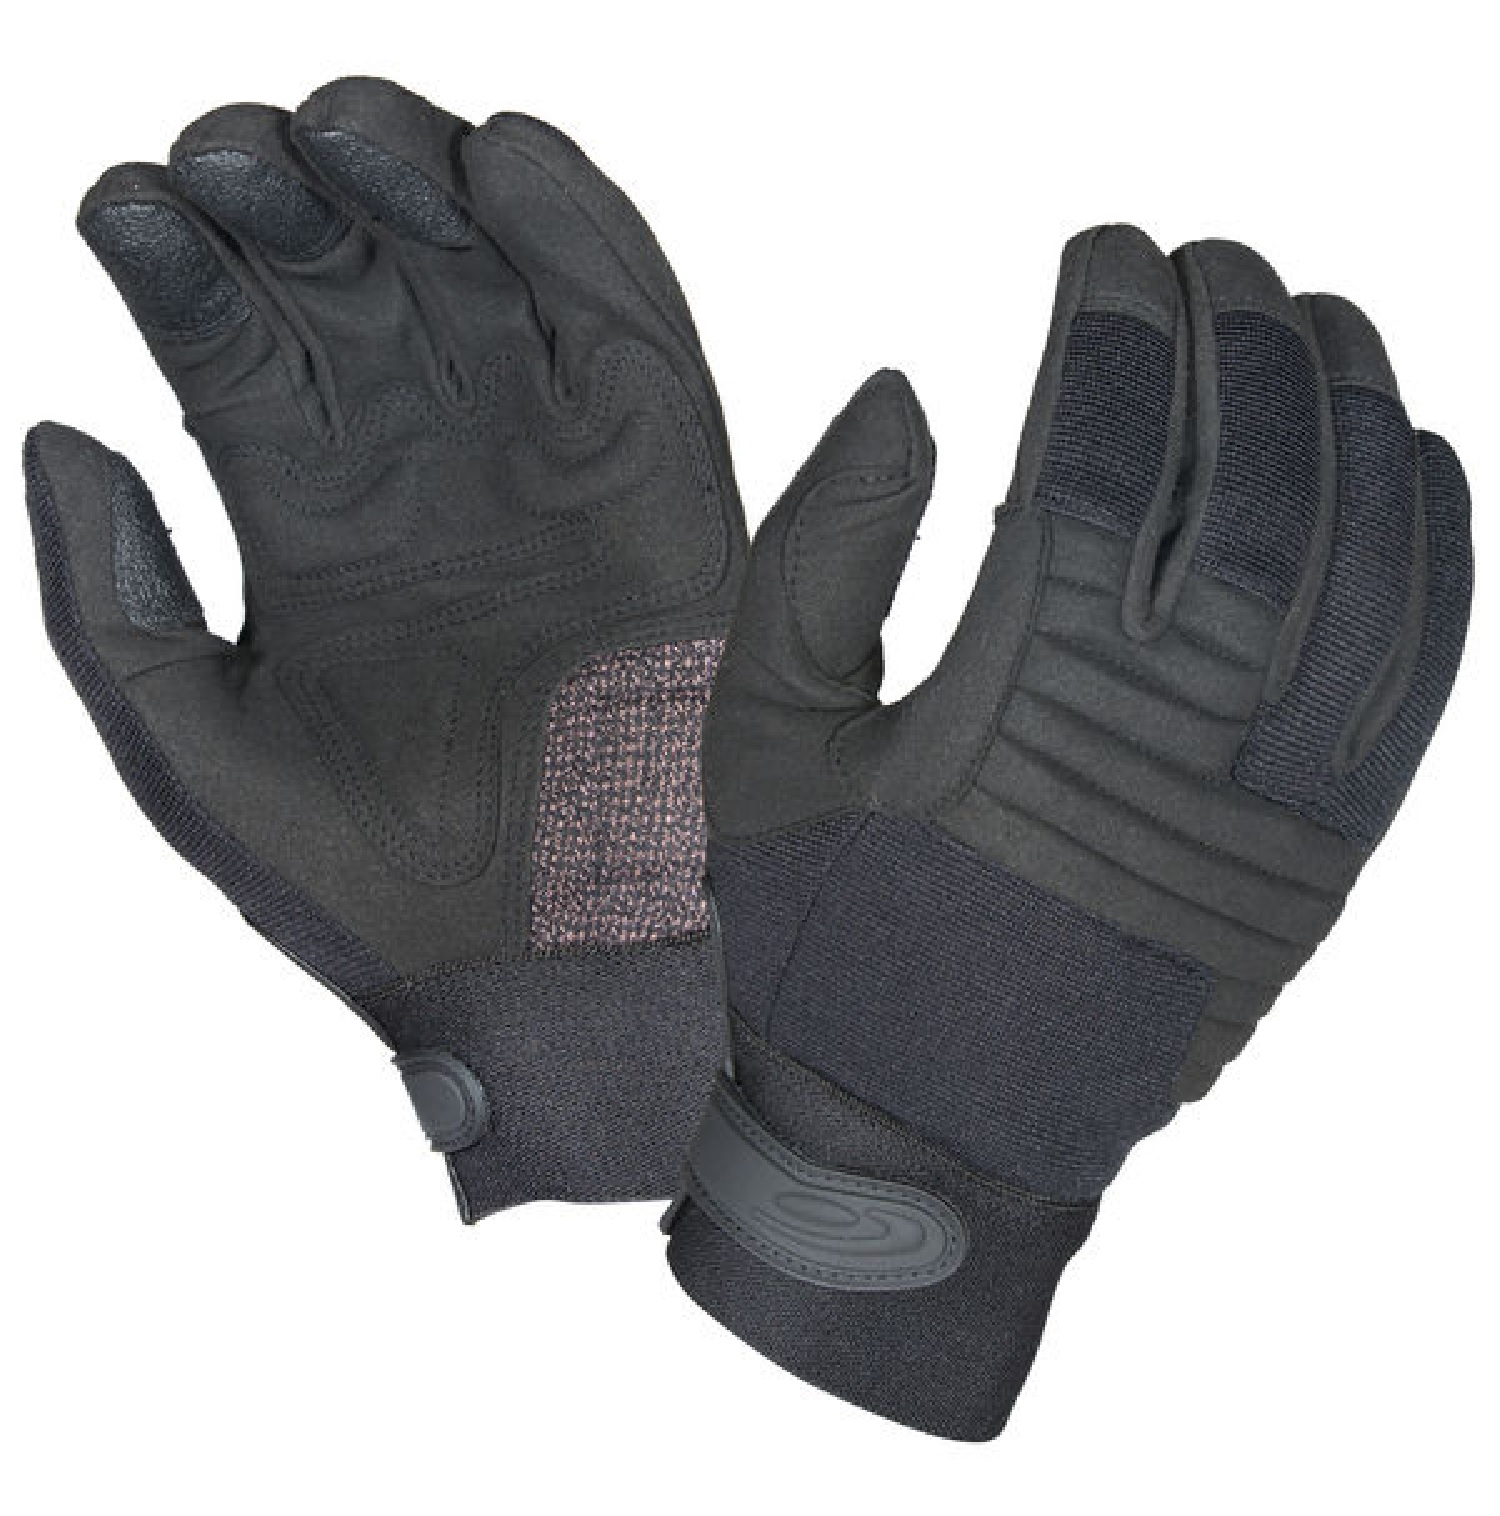 Hatch HMG100 Mechanics Glove Size Small